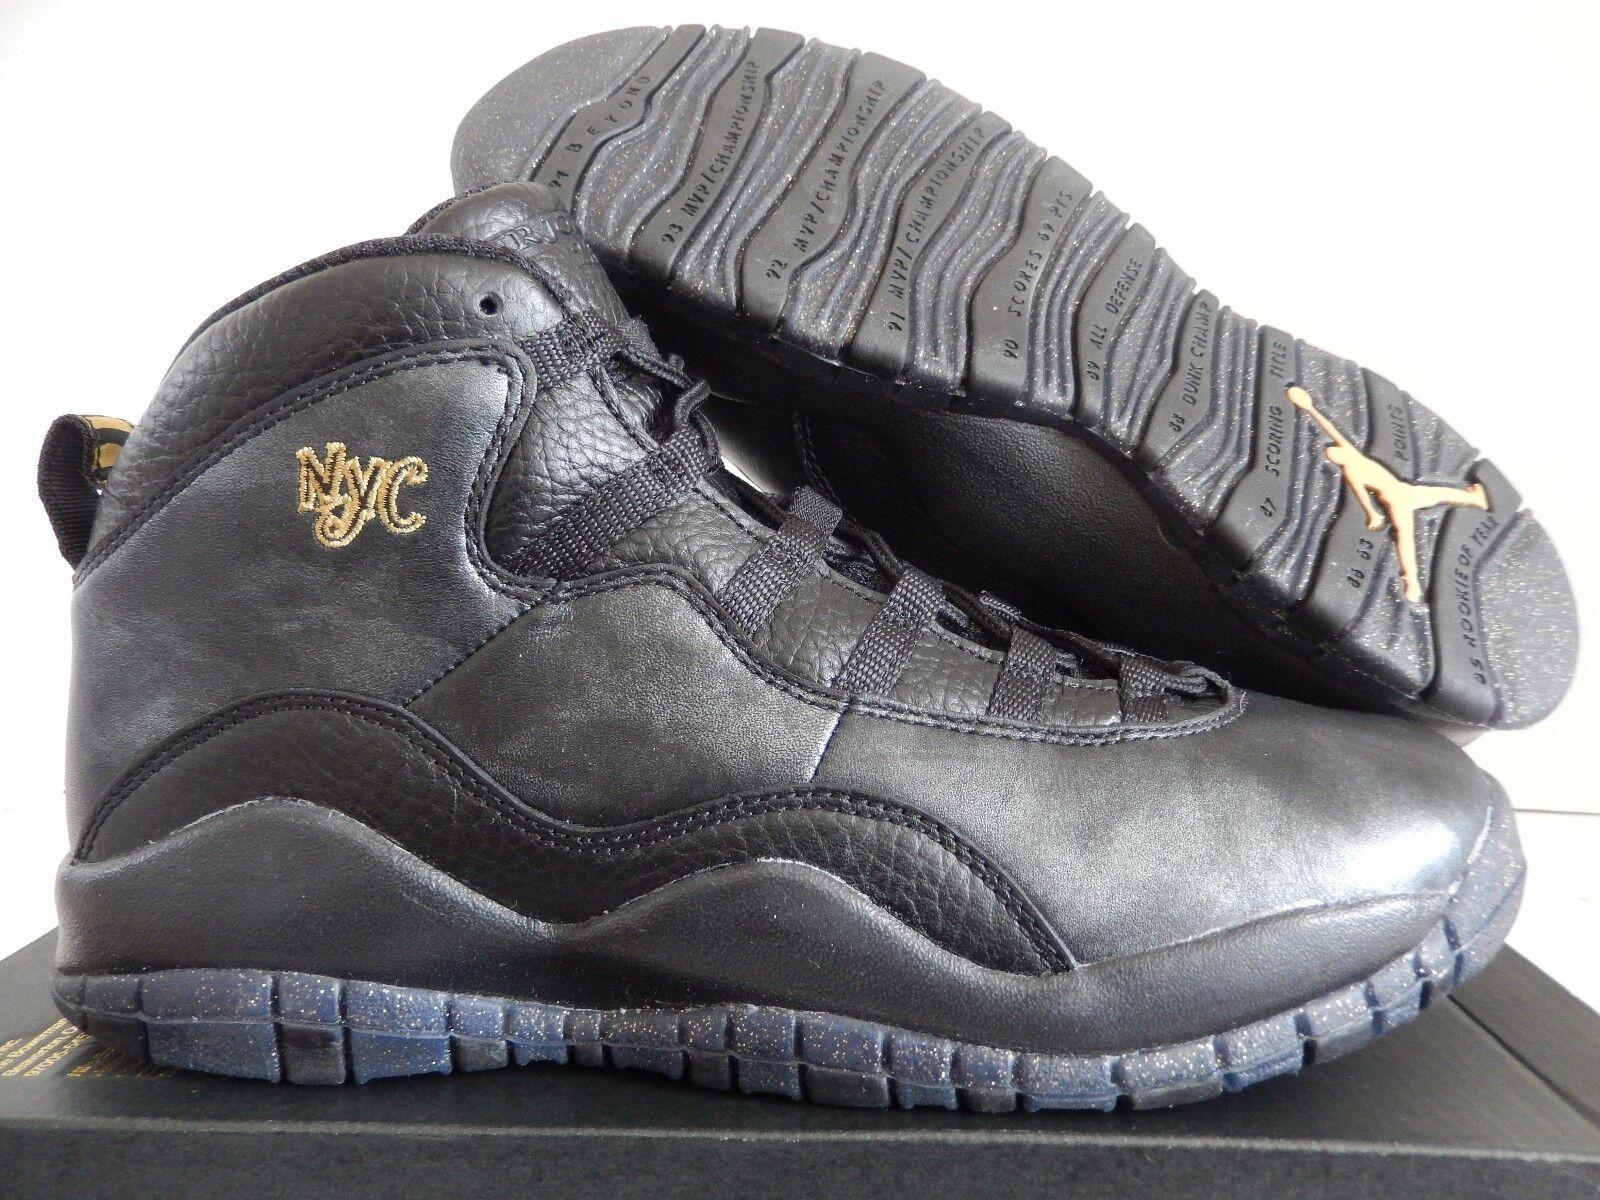 Nike air jordan 10 retrò bg new york city pack sz 4y-Donna sz - 310806-012]